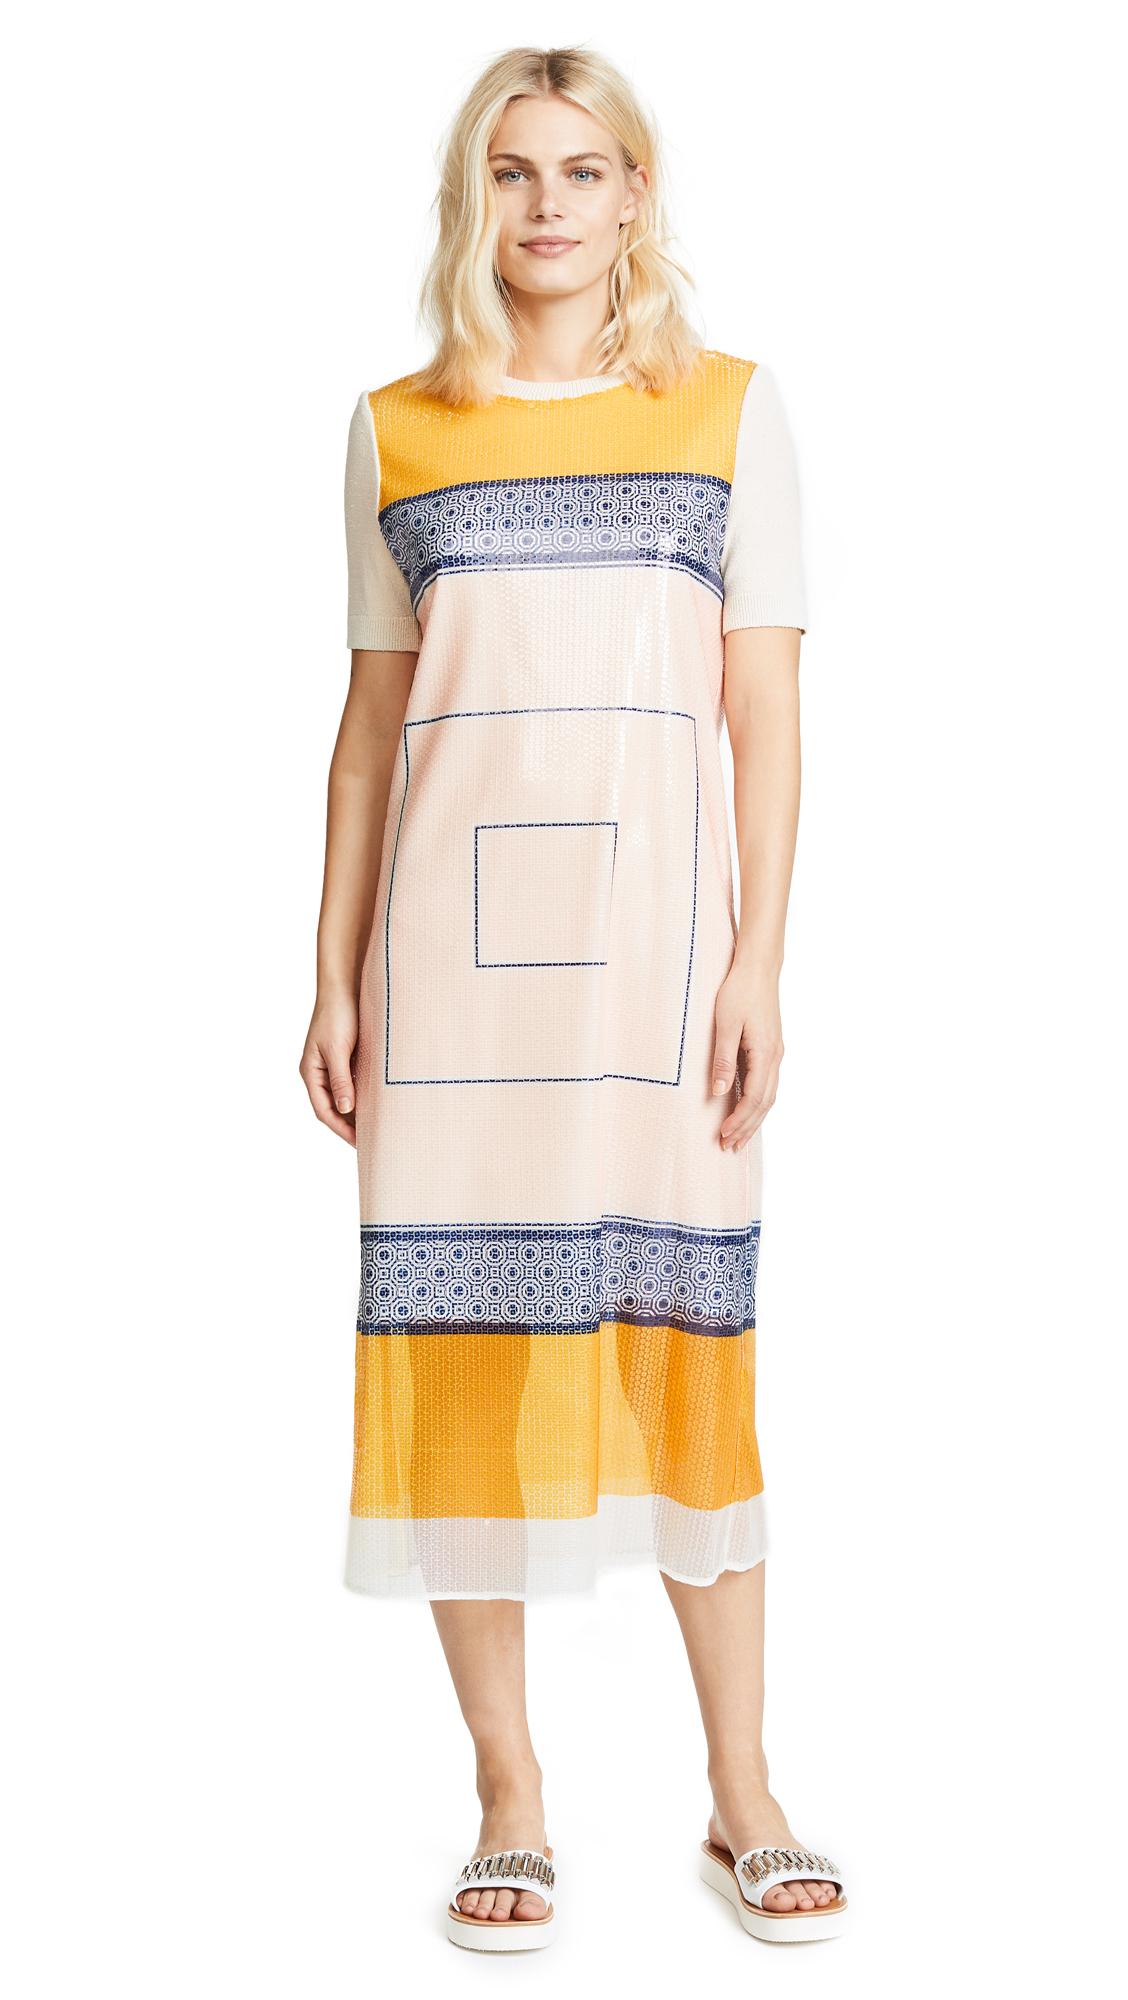 Tory Burch Maisie Dress